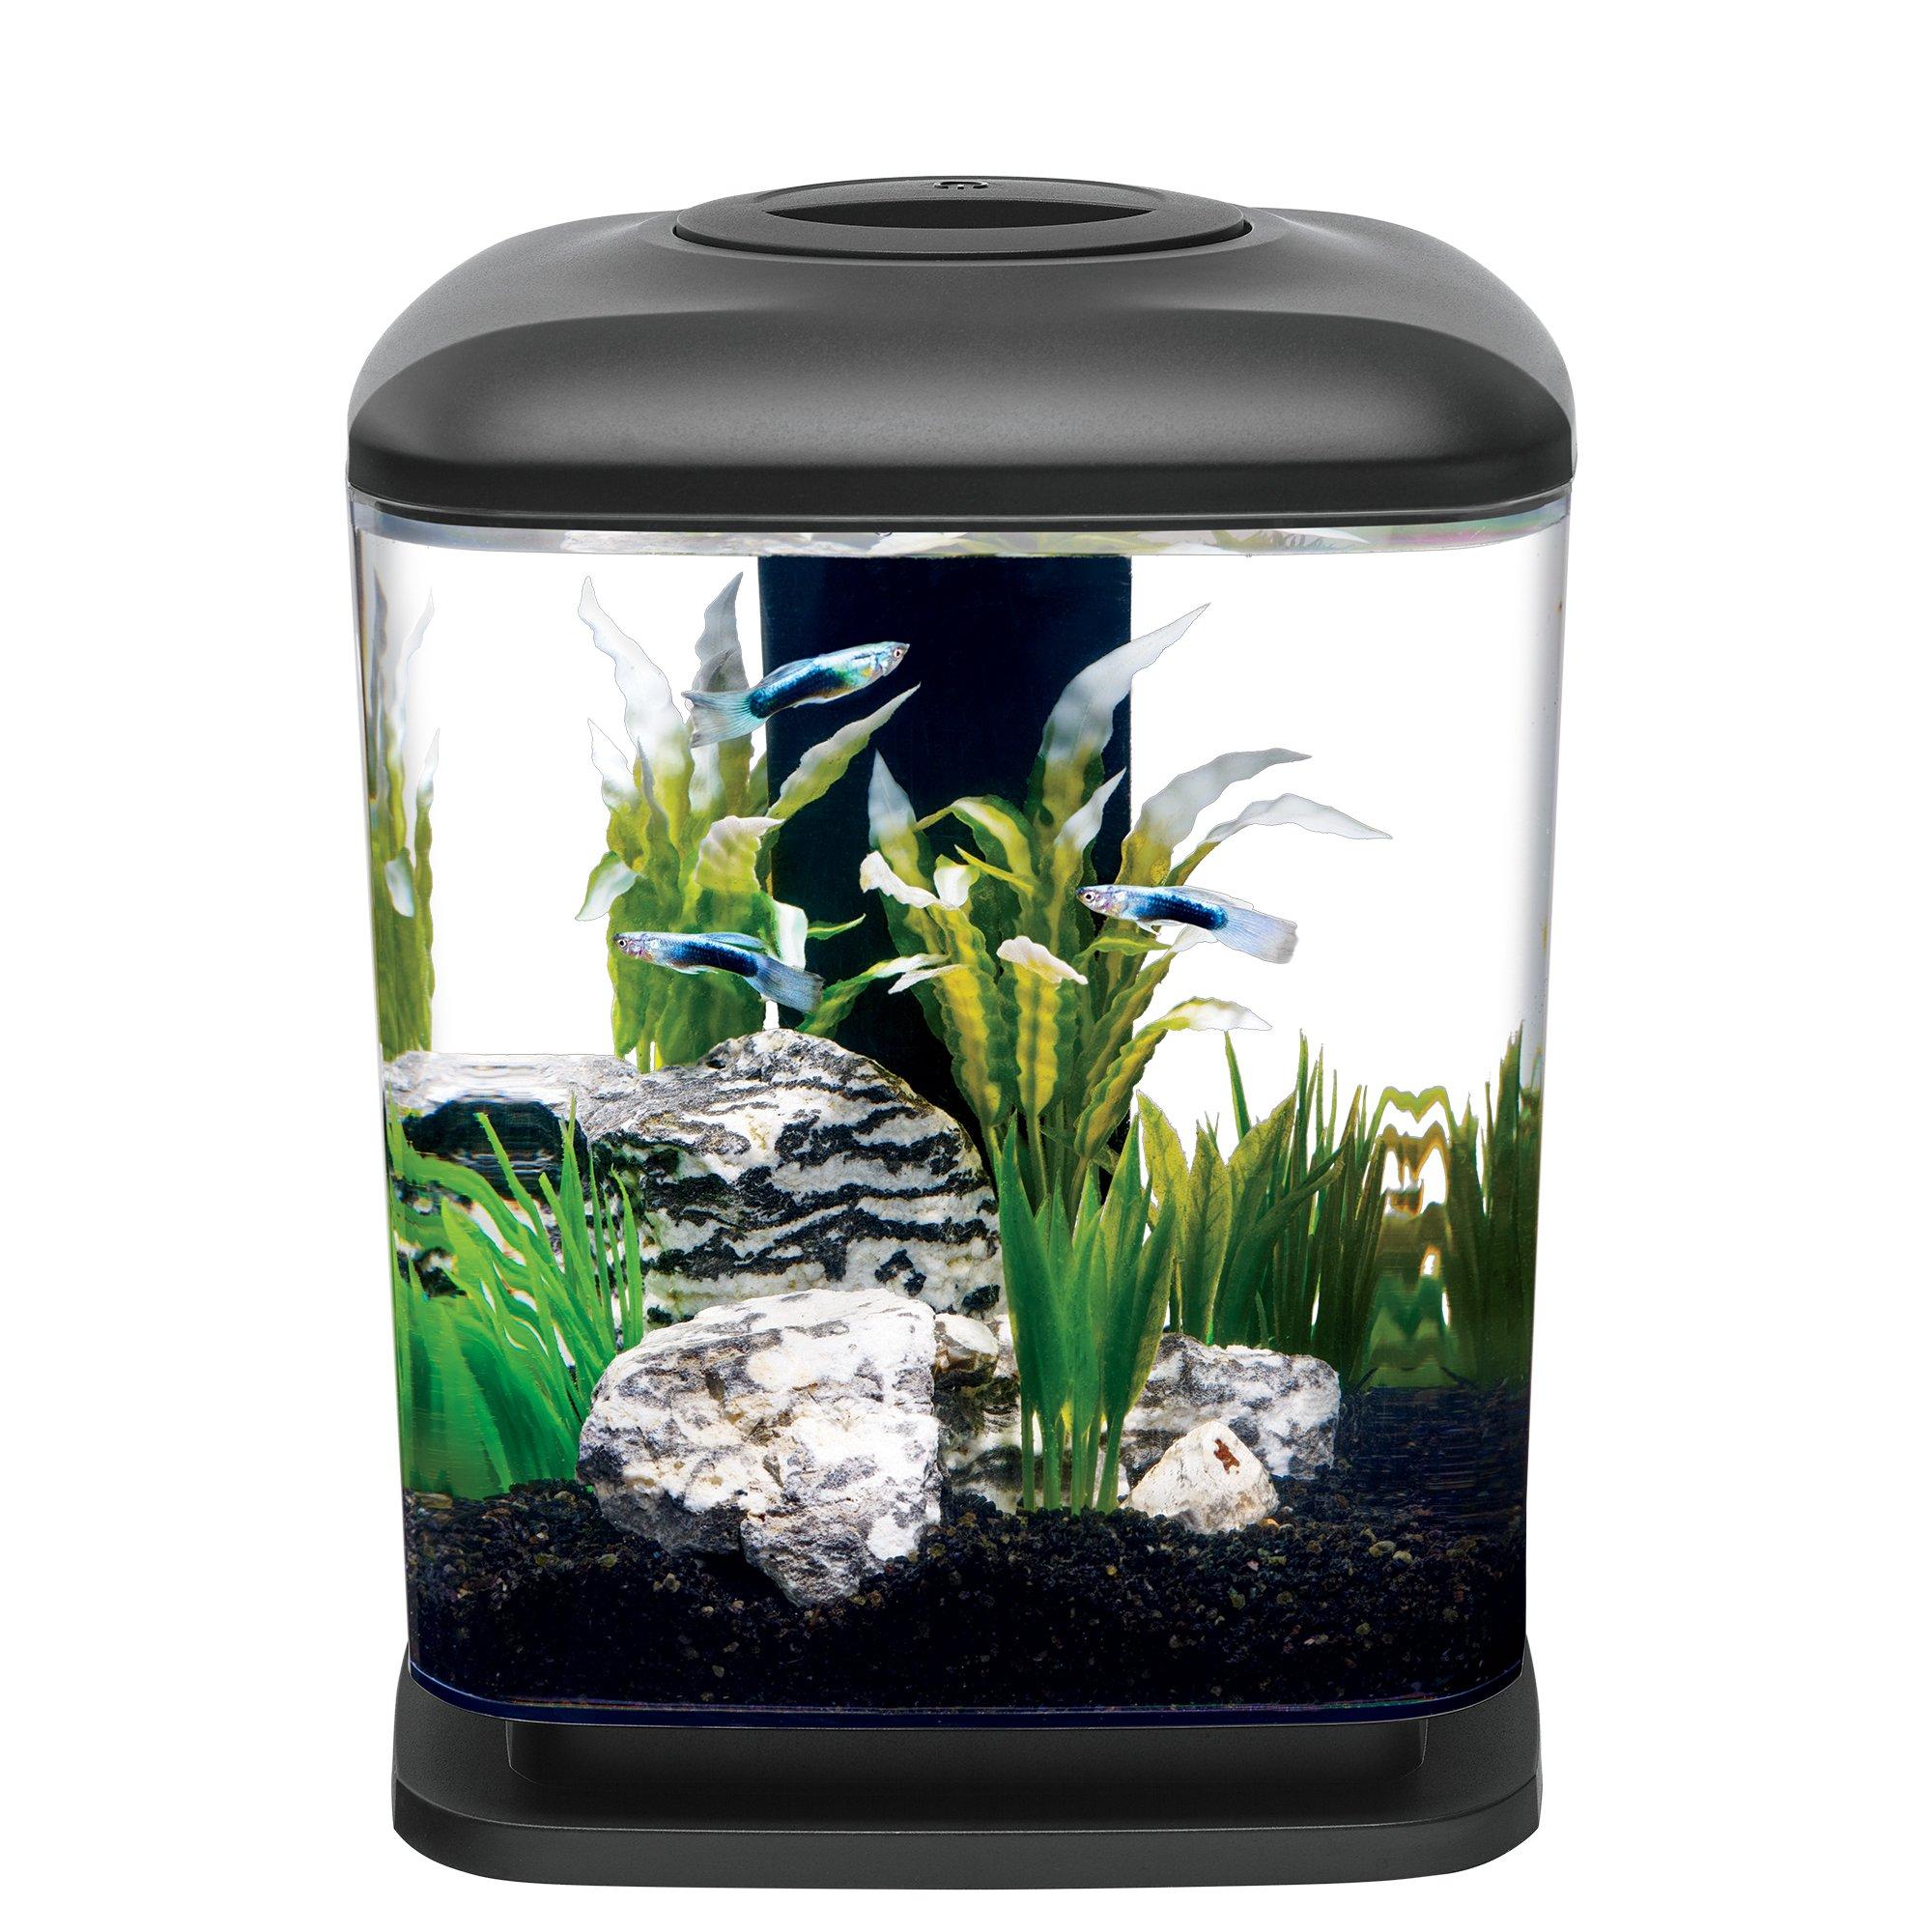 Aqueon led mini cube 1 6 gal petco for Petco small fish tank